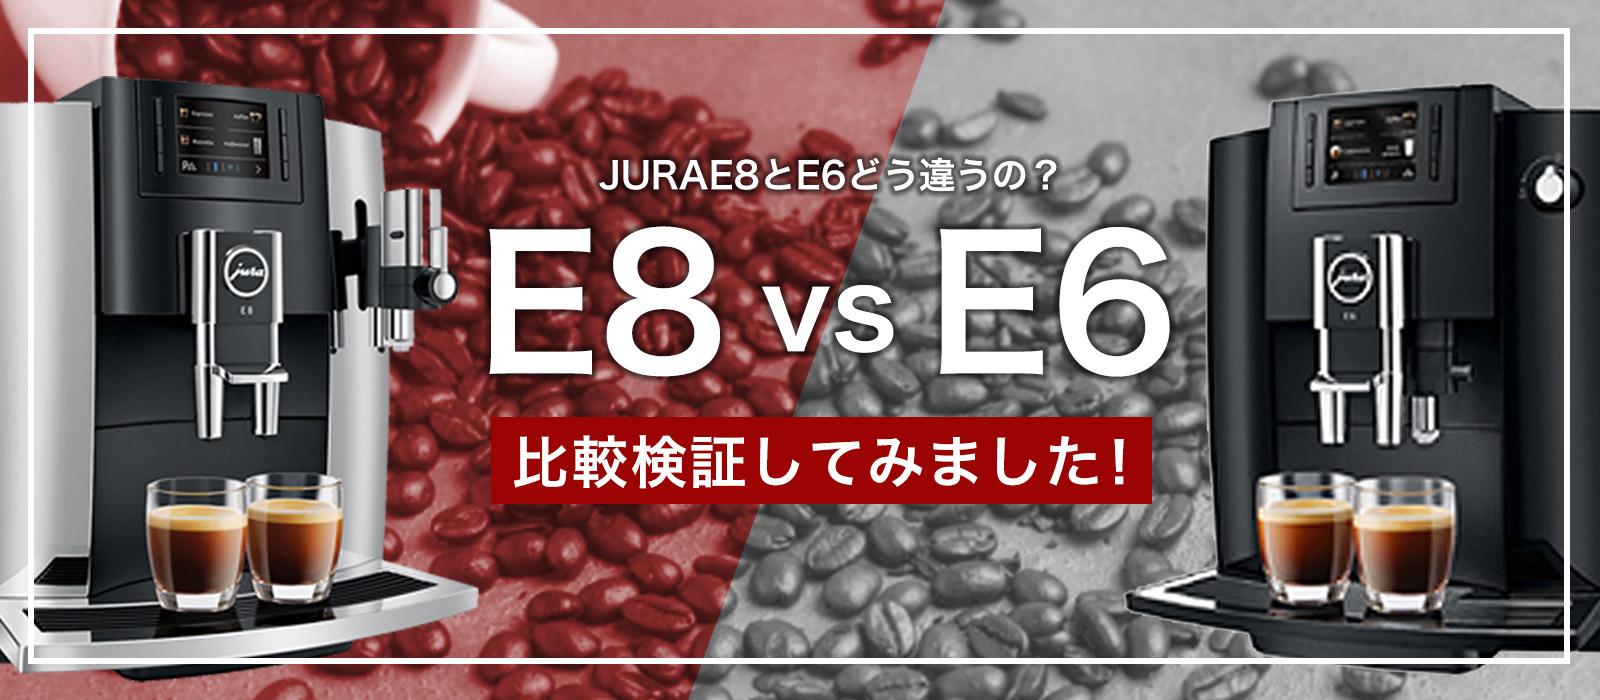 JURAE6とE8の選択で困ったら!